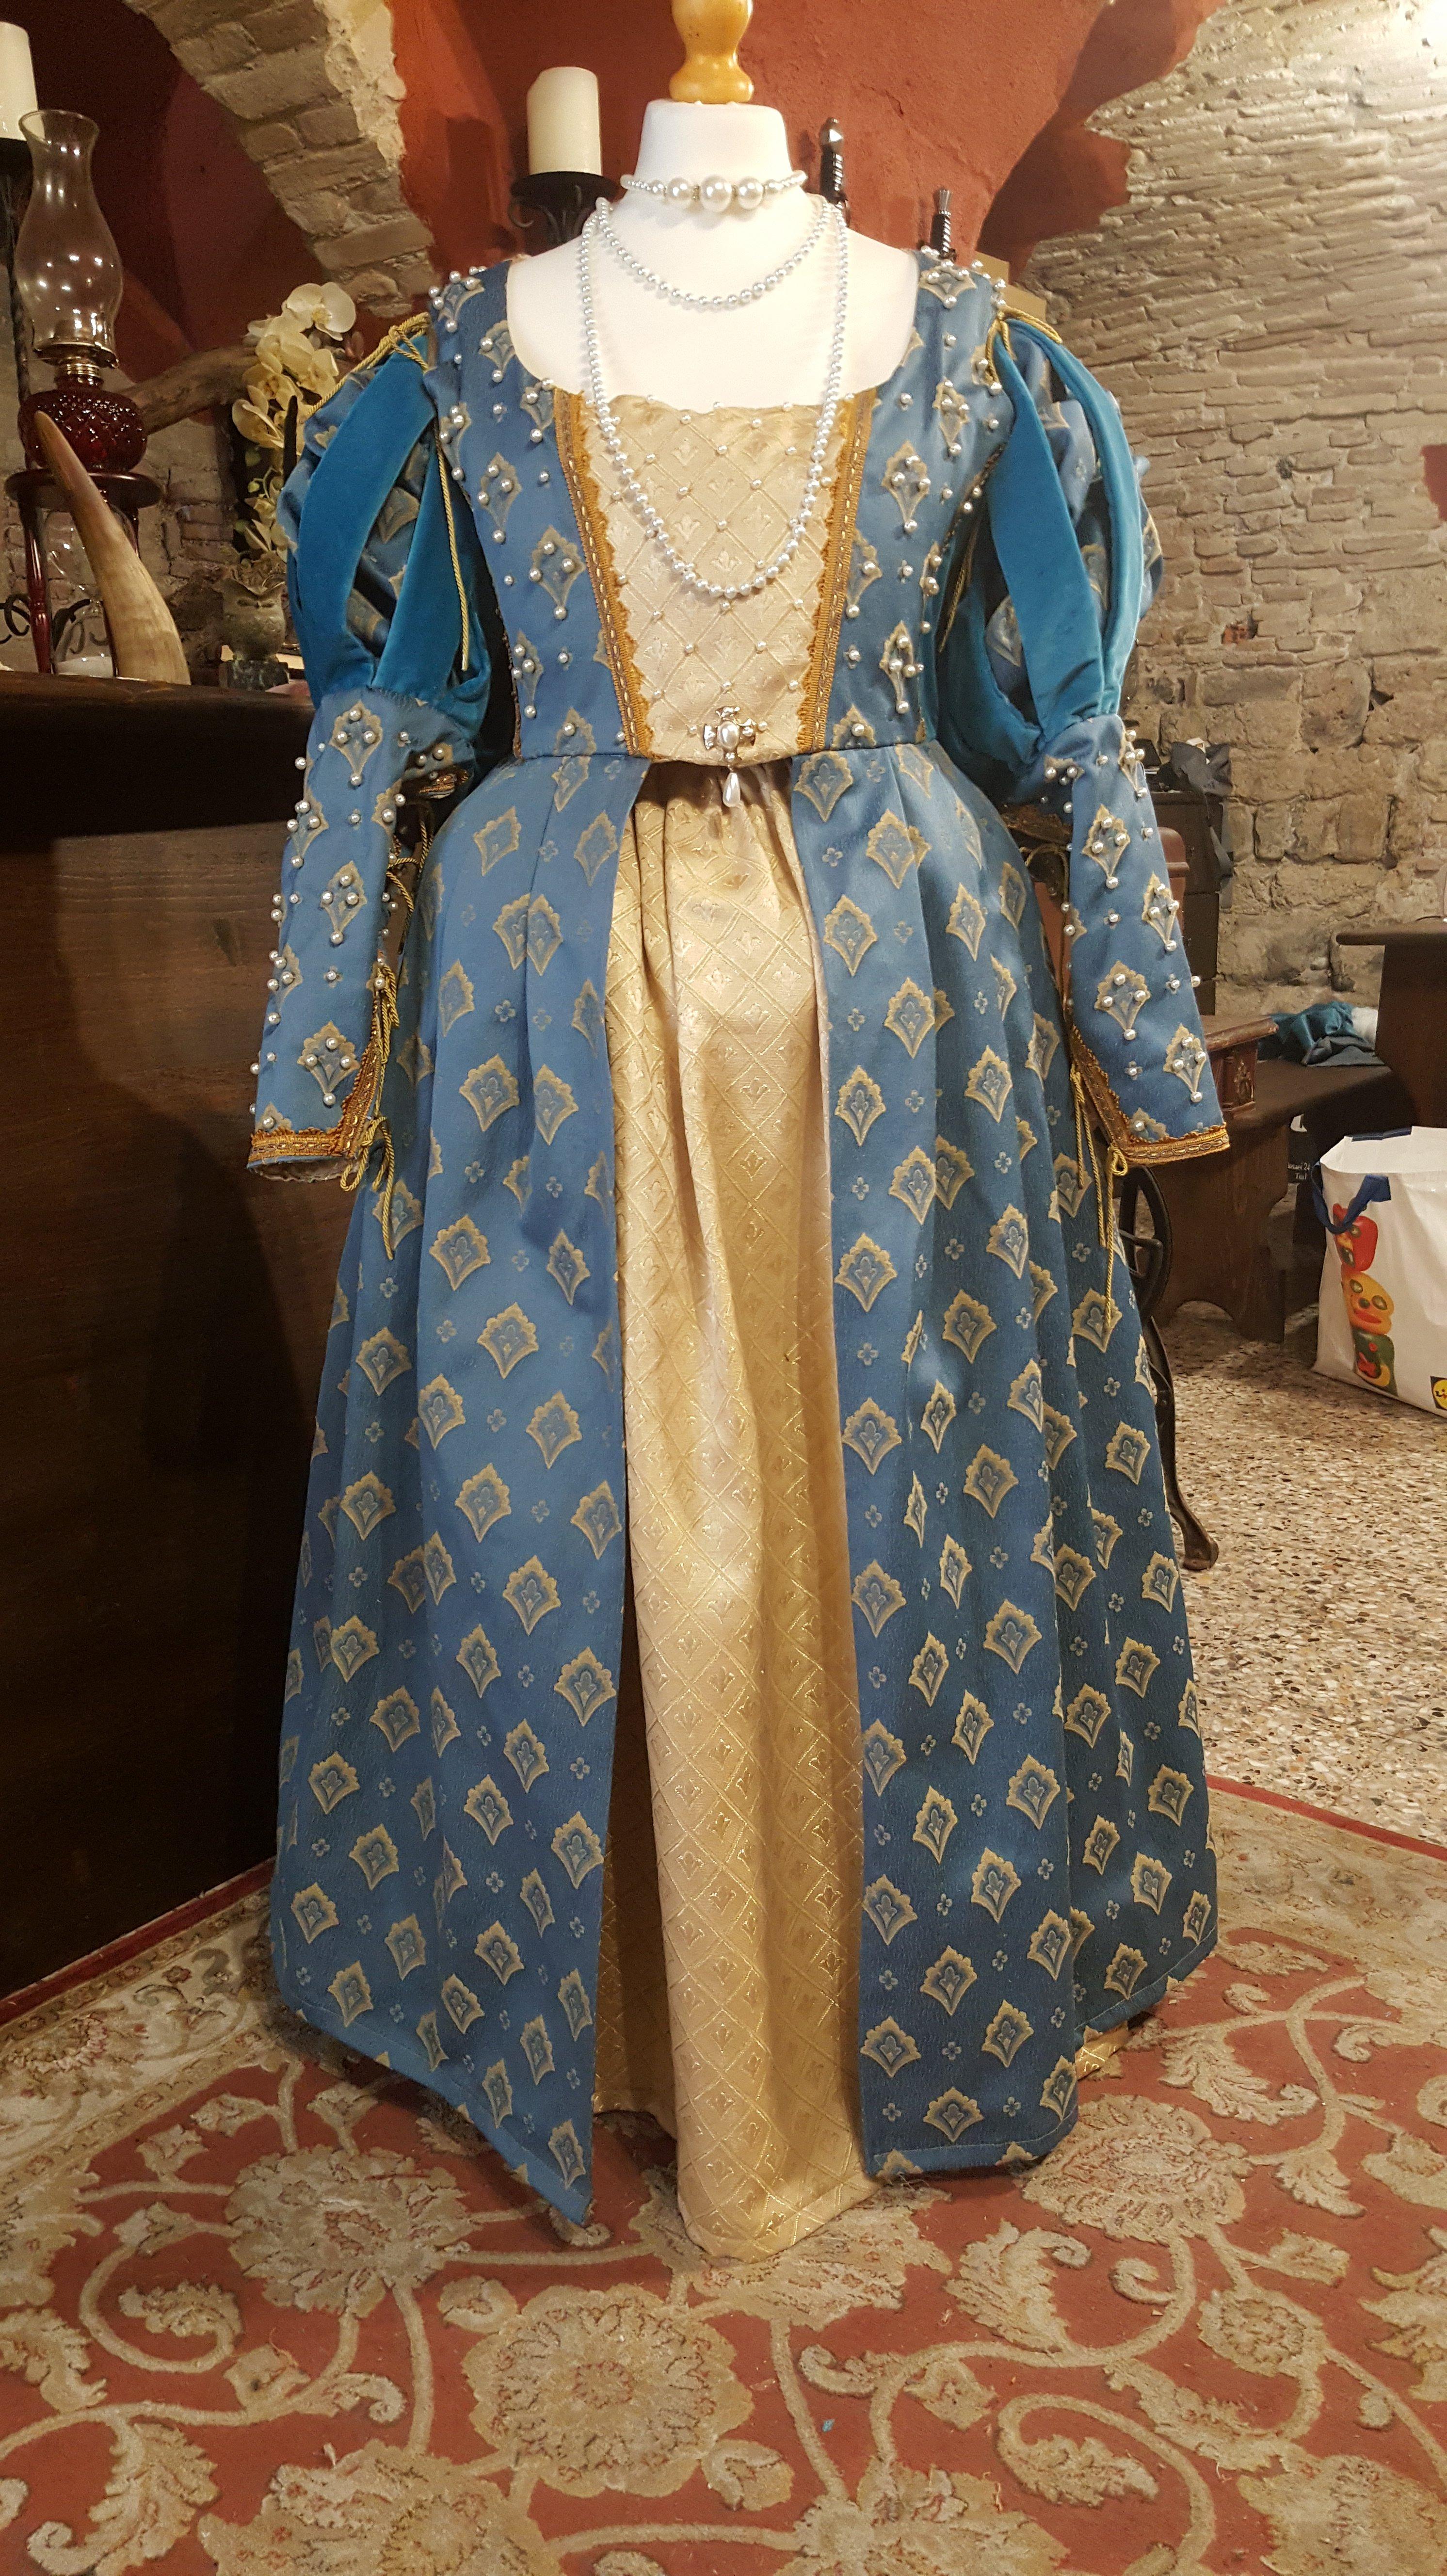 Veste da donna rinascimentale turchese